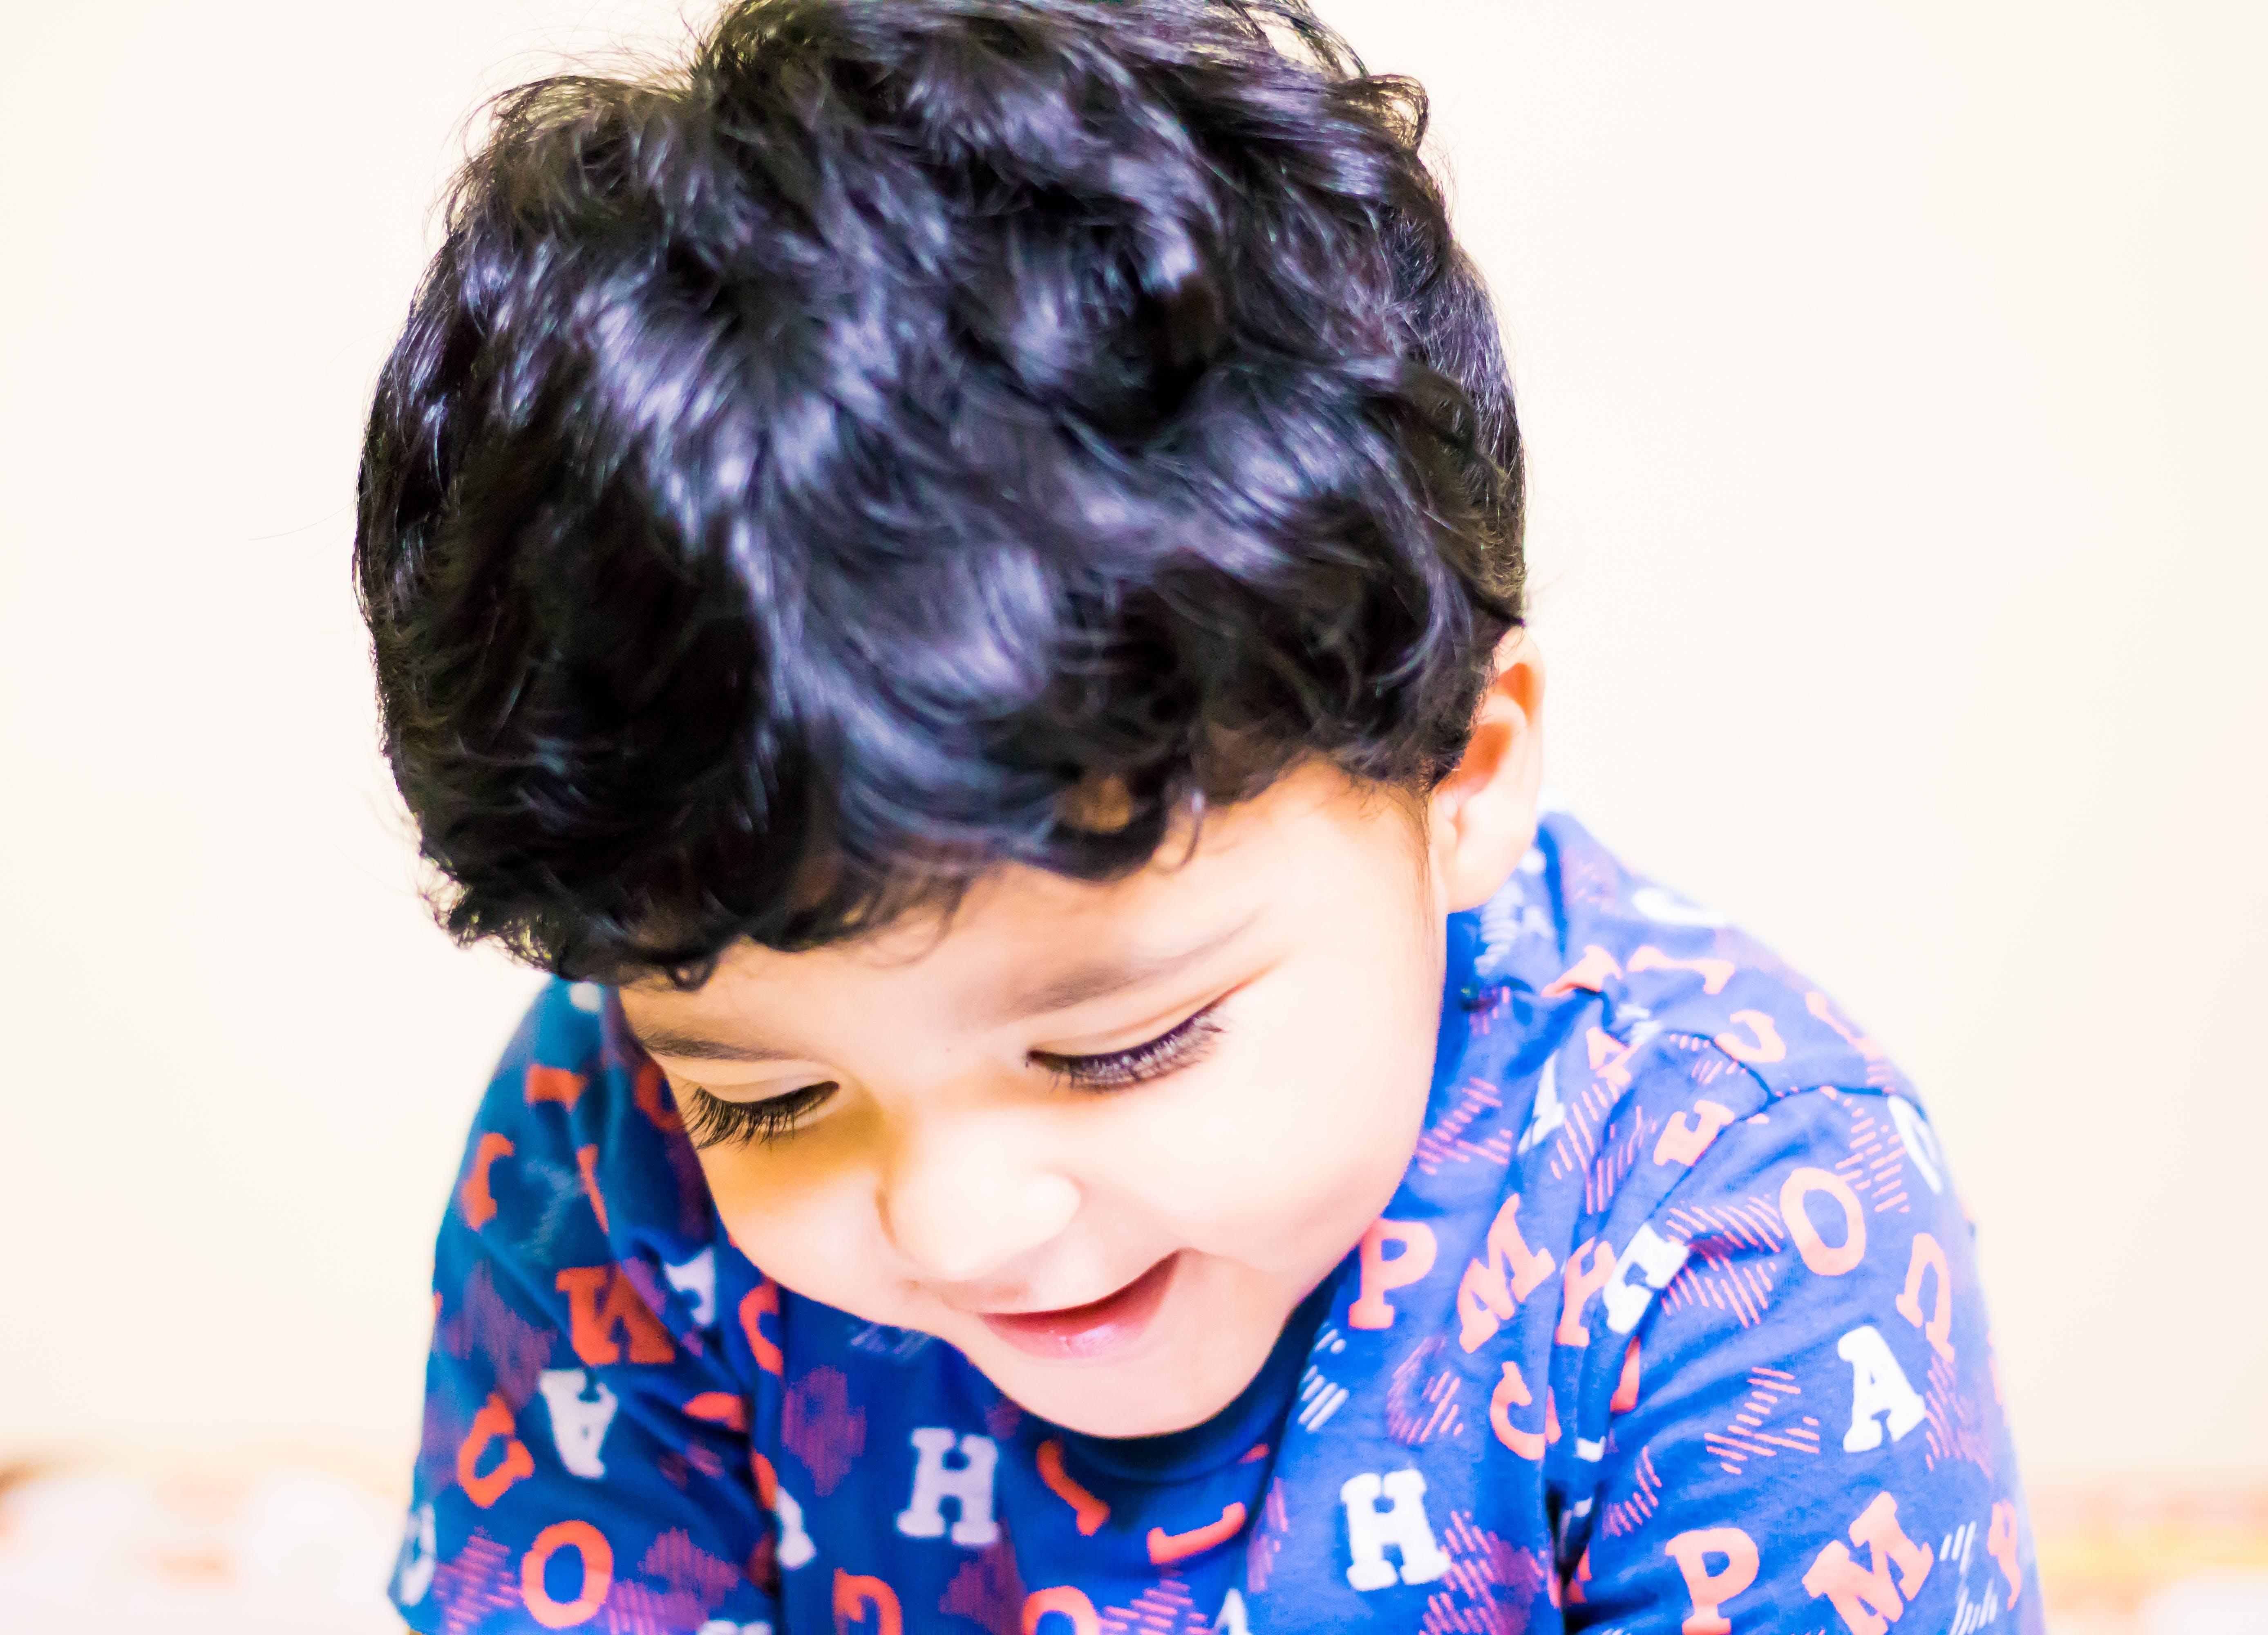 Free stock photo of boy, boys, child, child portrait